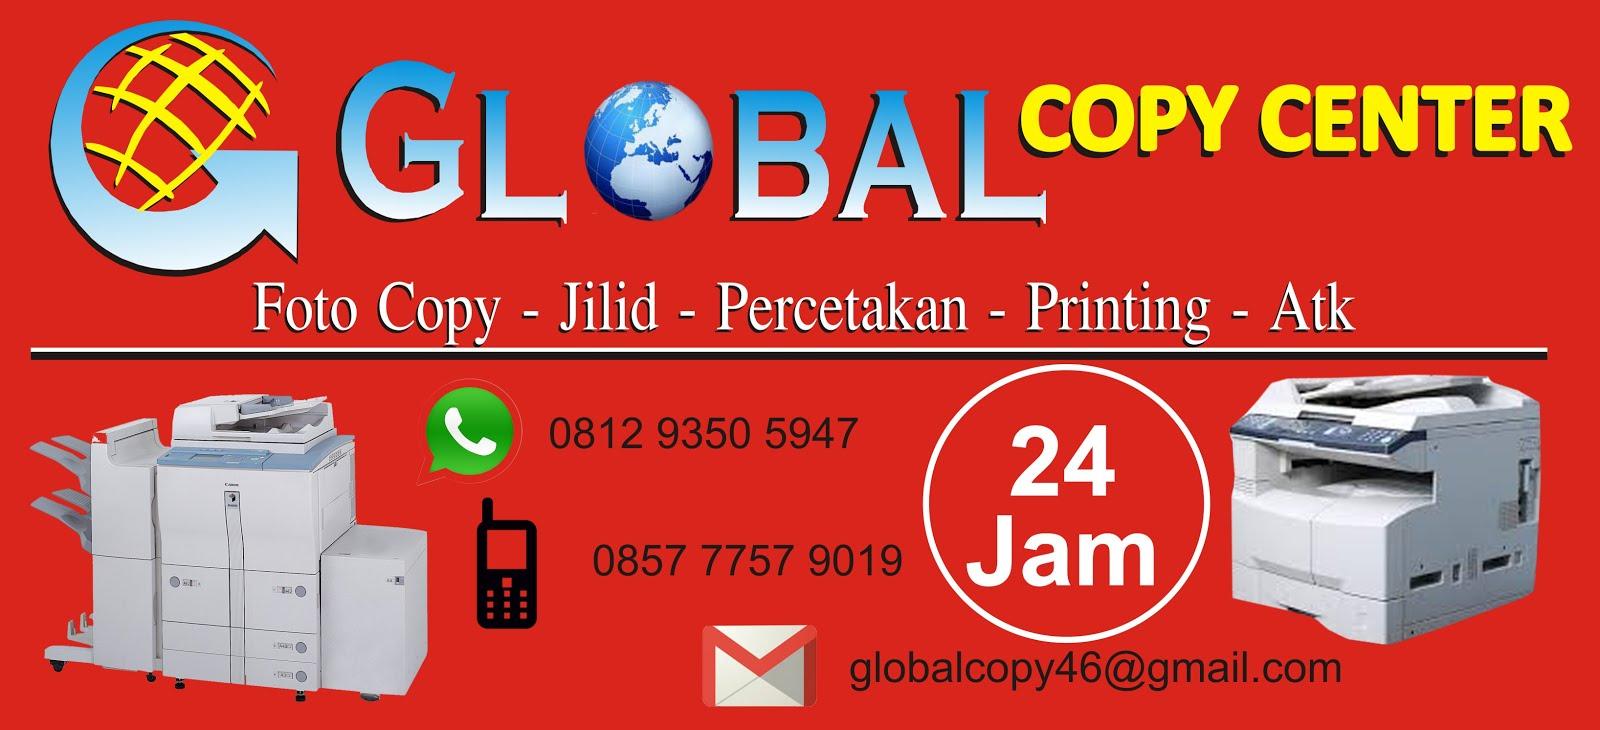 Global » Jasa Fotocopy | Penjilidan | Percetakan | Printing Murah 24 Jam di Jakarta